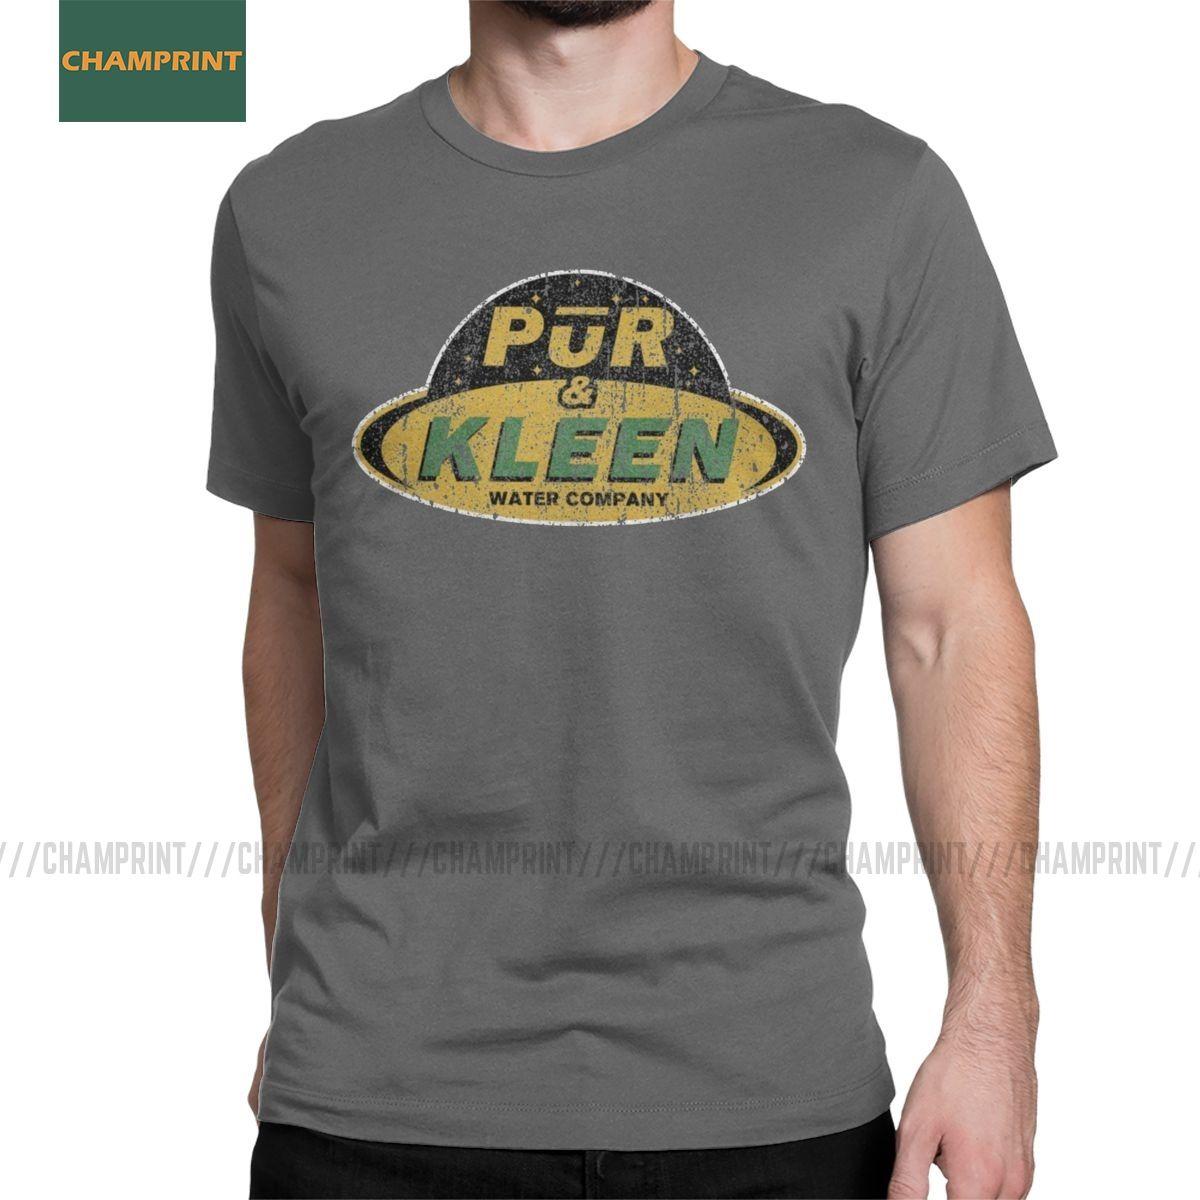 Pur Kleen Water Company Die Expanse T-Shirt für Männer MCRN Sci-Fi Science Fiction Neuheit aus reiner Baumwolle T-Shirts Kurzarm T-Shirt